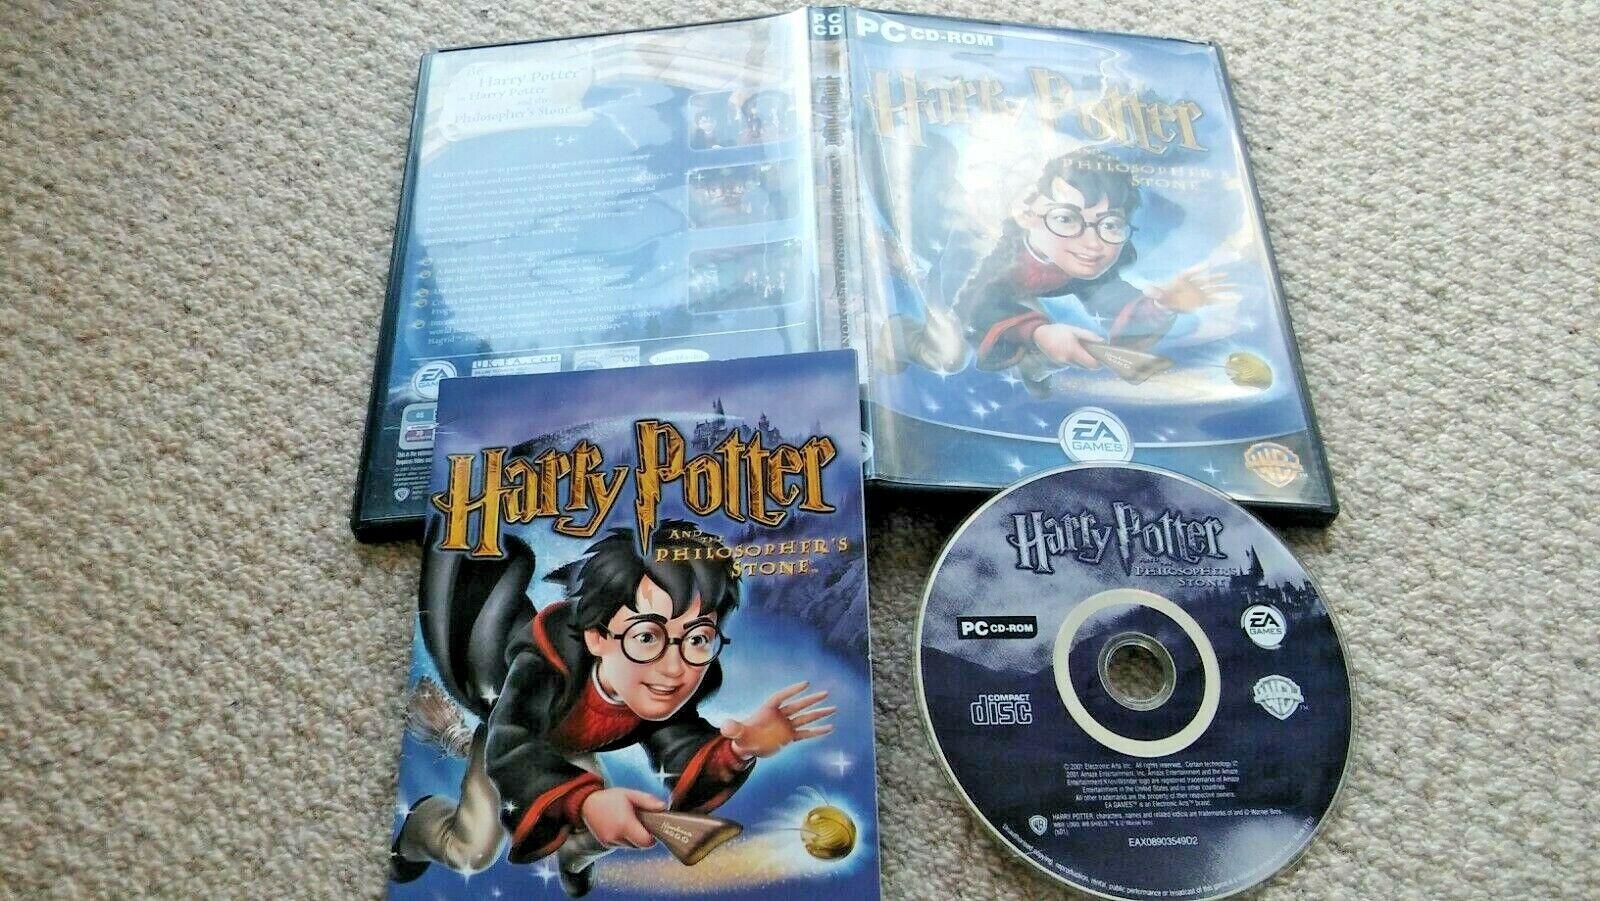 retro computer games - HARRY POTTER & The Philosopher's Stone PC CD ROM Computer Game 2001 Retro